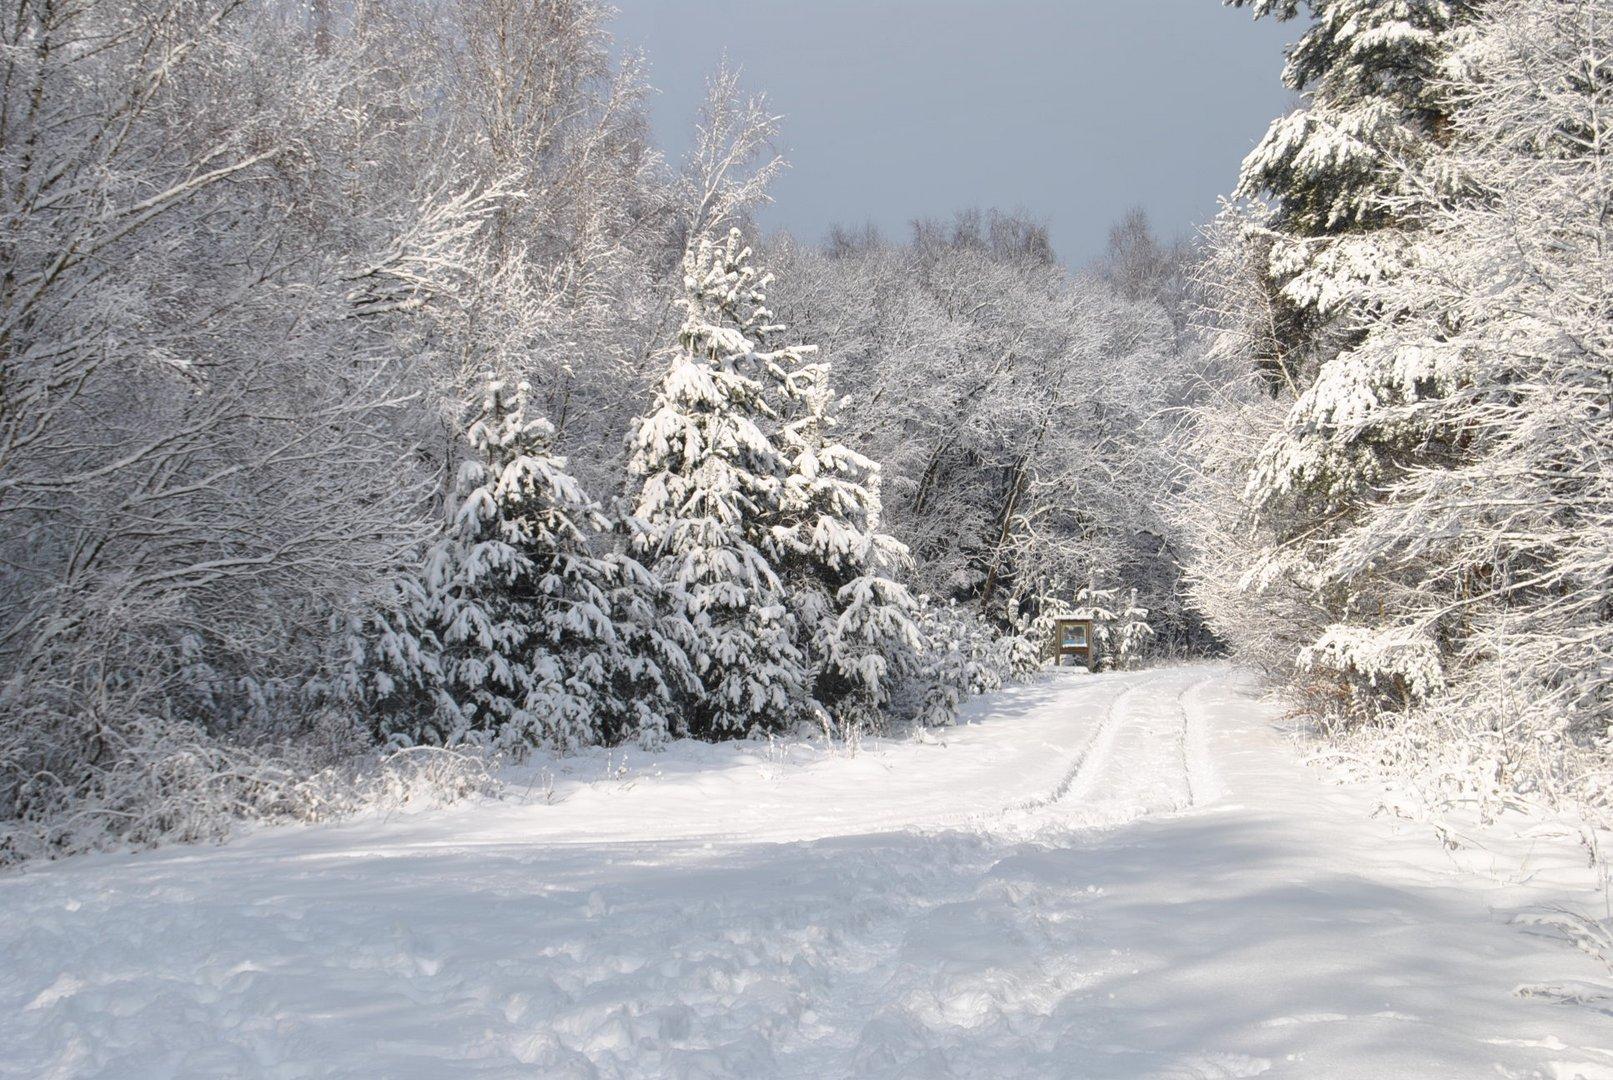 Winterwonderland!